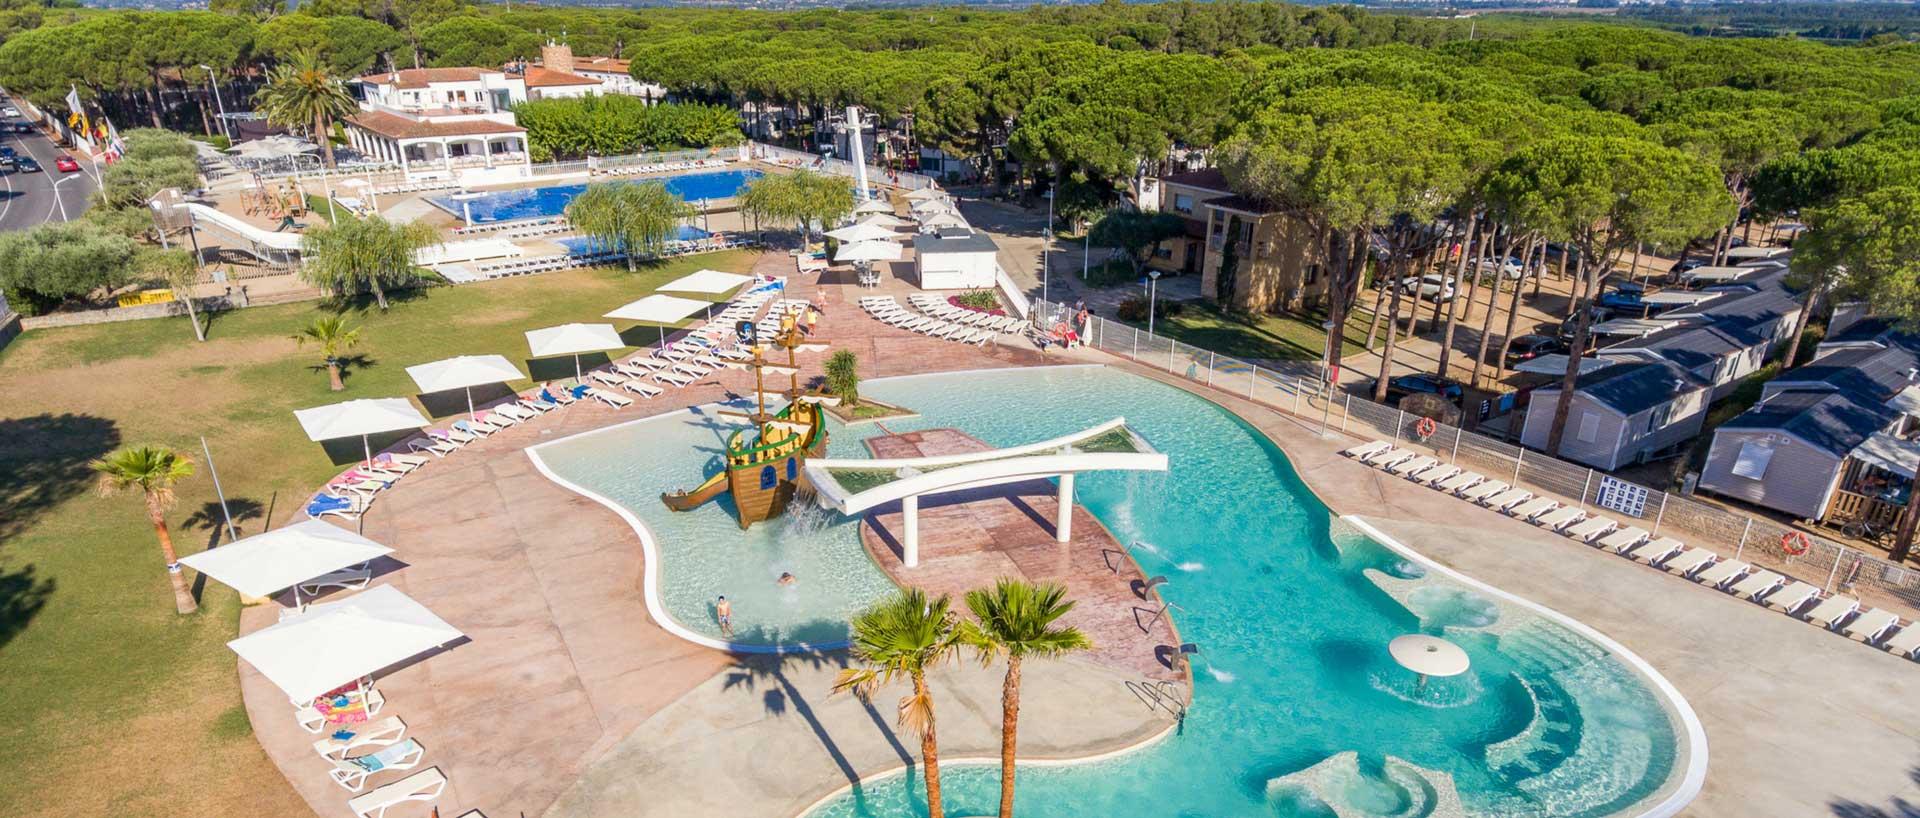 Supertrips - Cypsela Resort